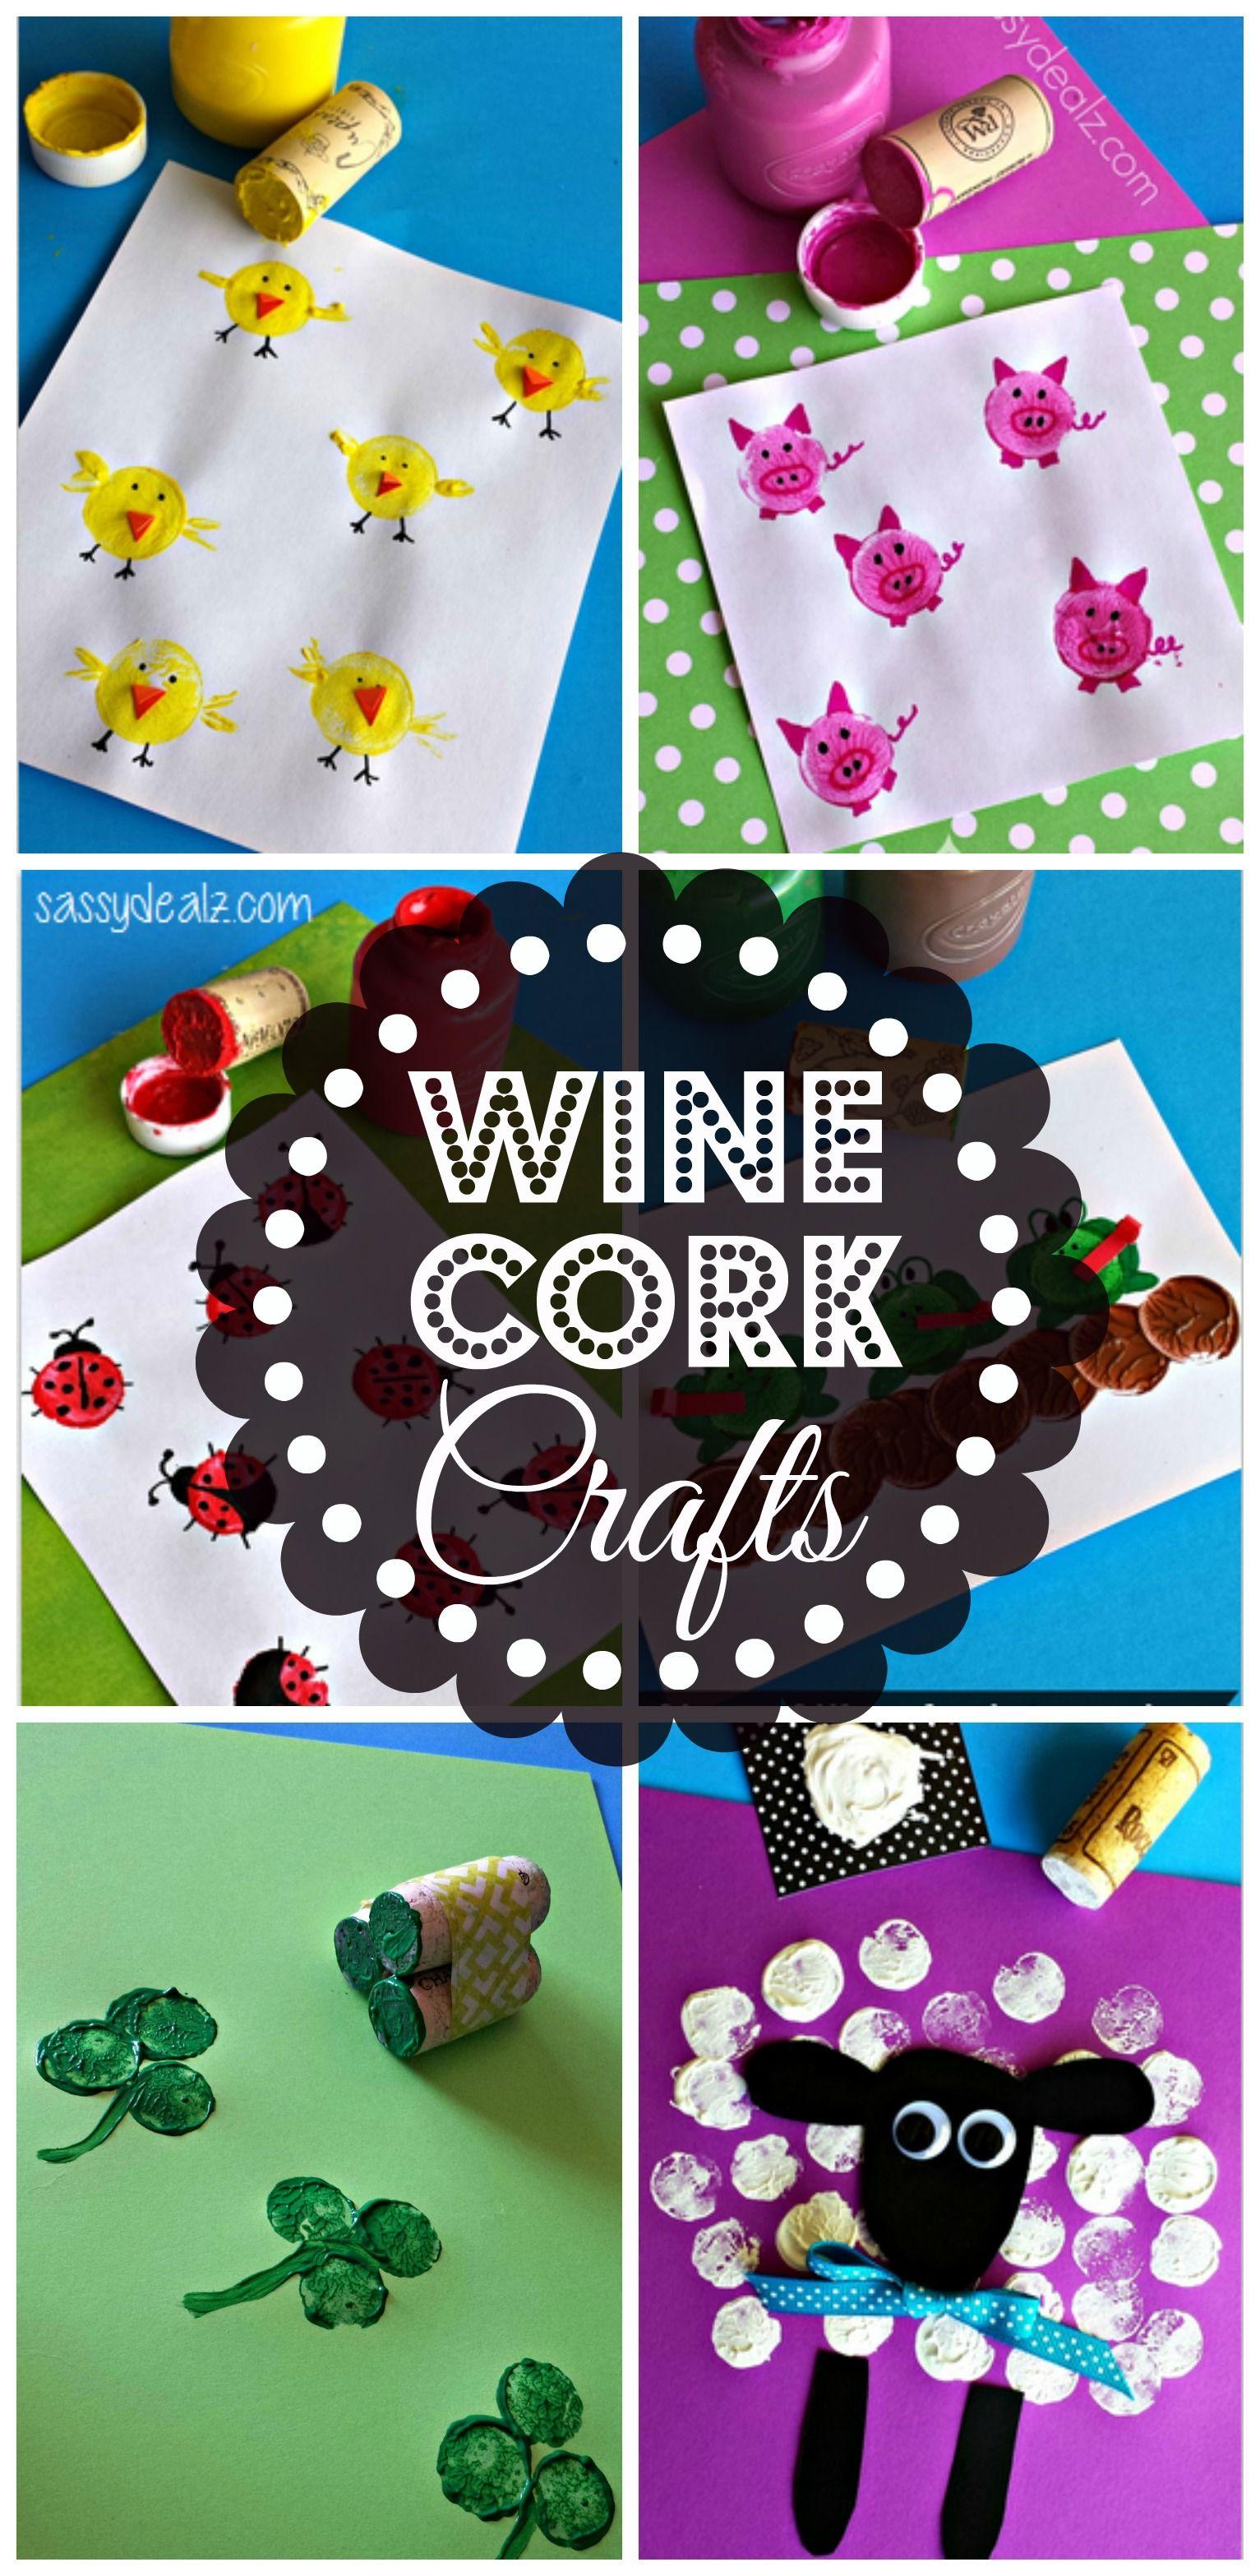 Wine Cork Crafts & Art Project for Kids #DIY #Kids crafts | http://www.sassydealz.com/2014/04/wine-cork-crafts-art-project-kids.html